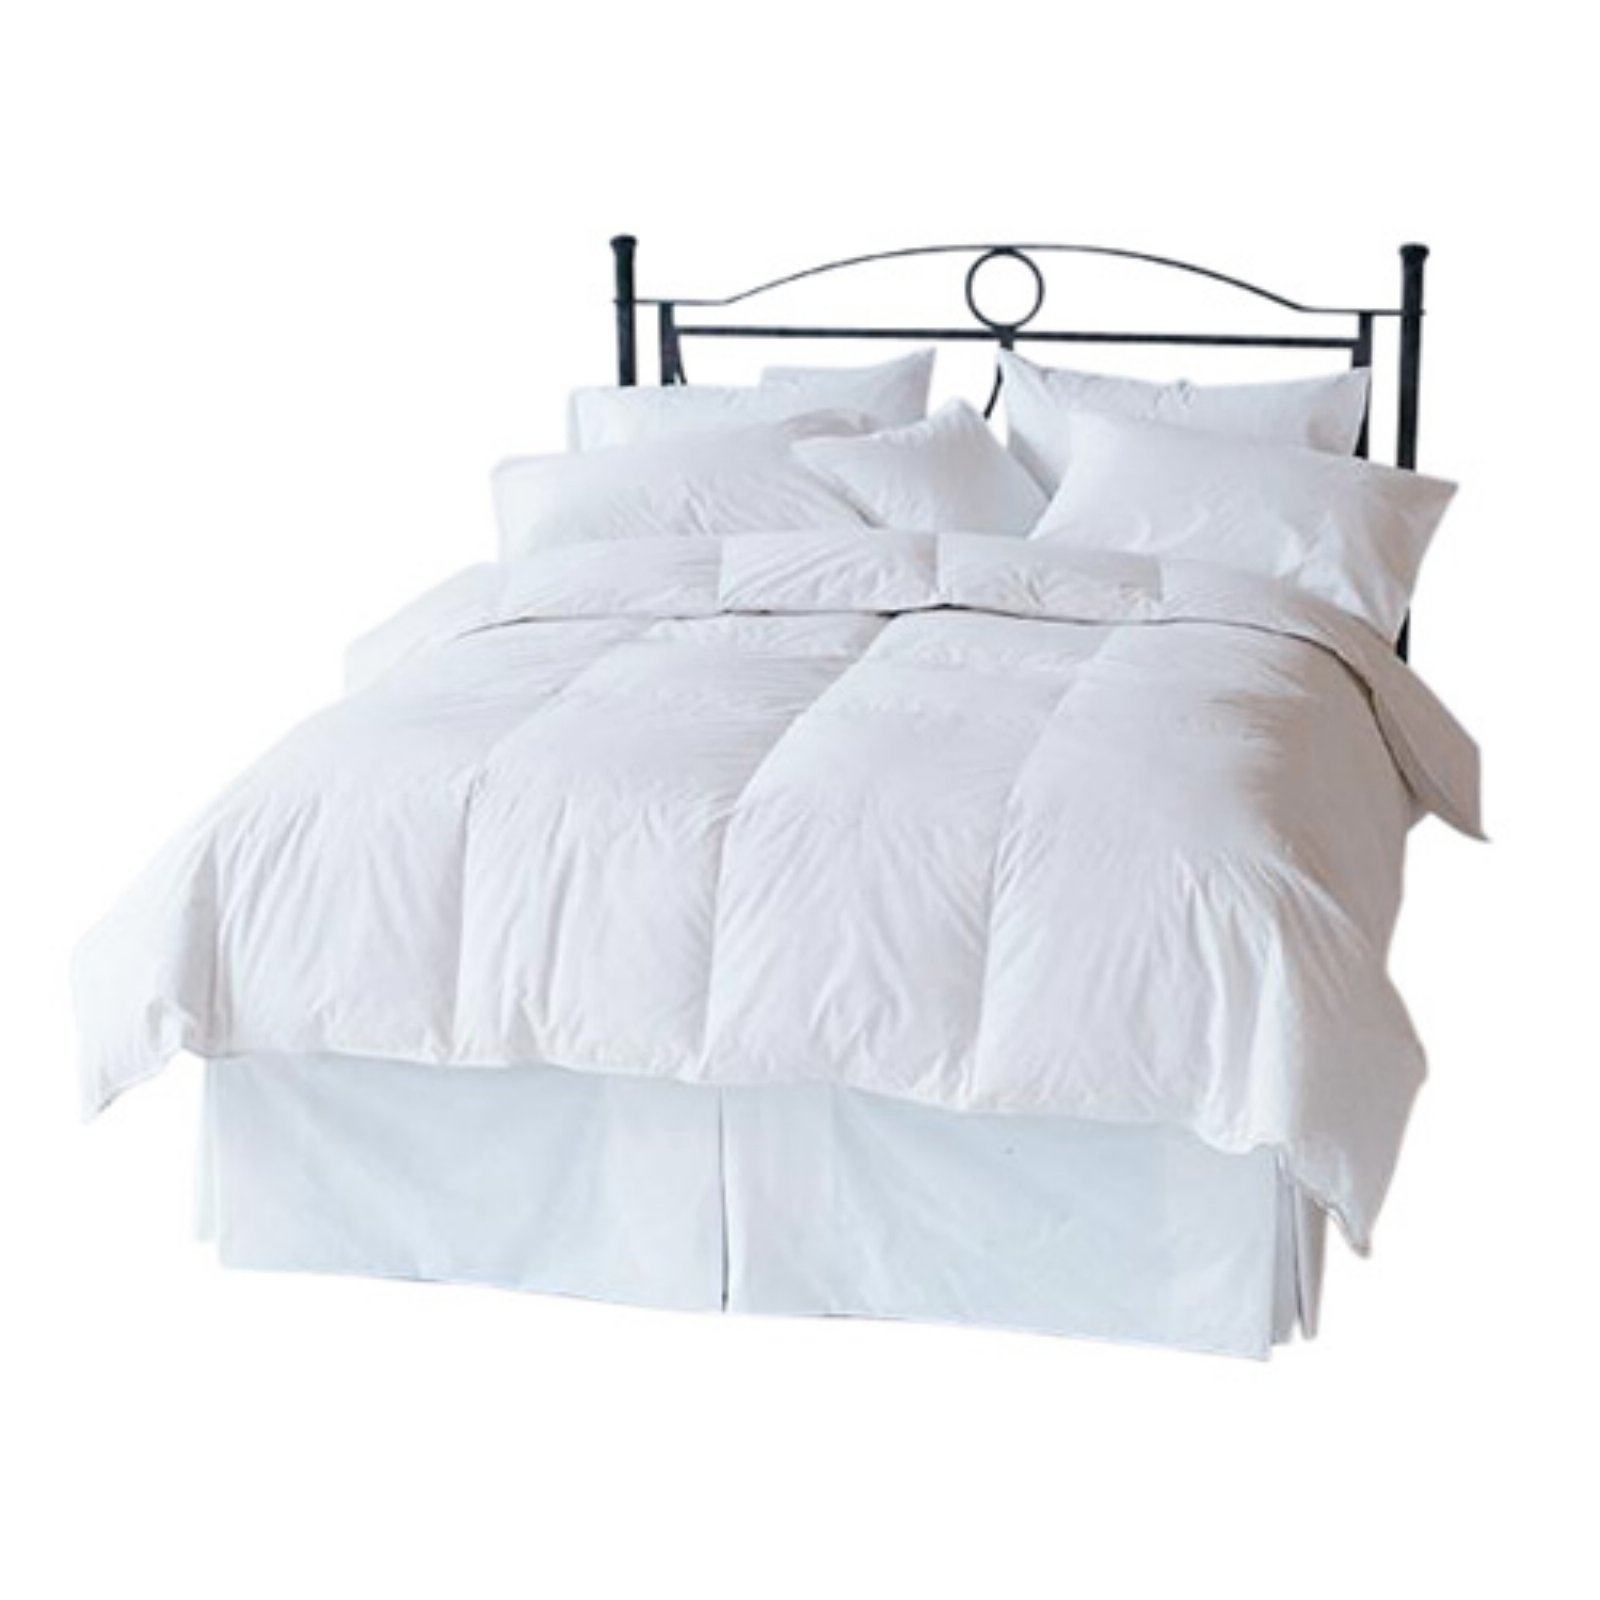 Daniadown Pinnacle Down Comforter - Summer Weight